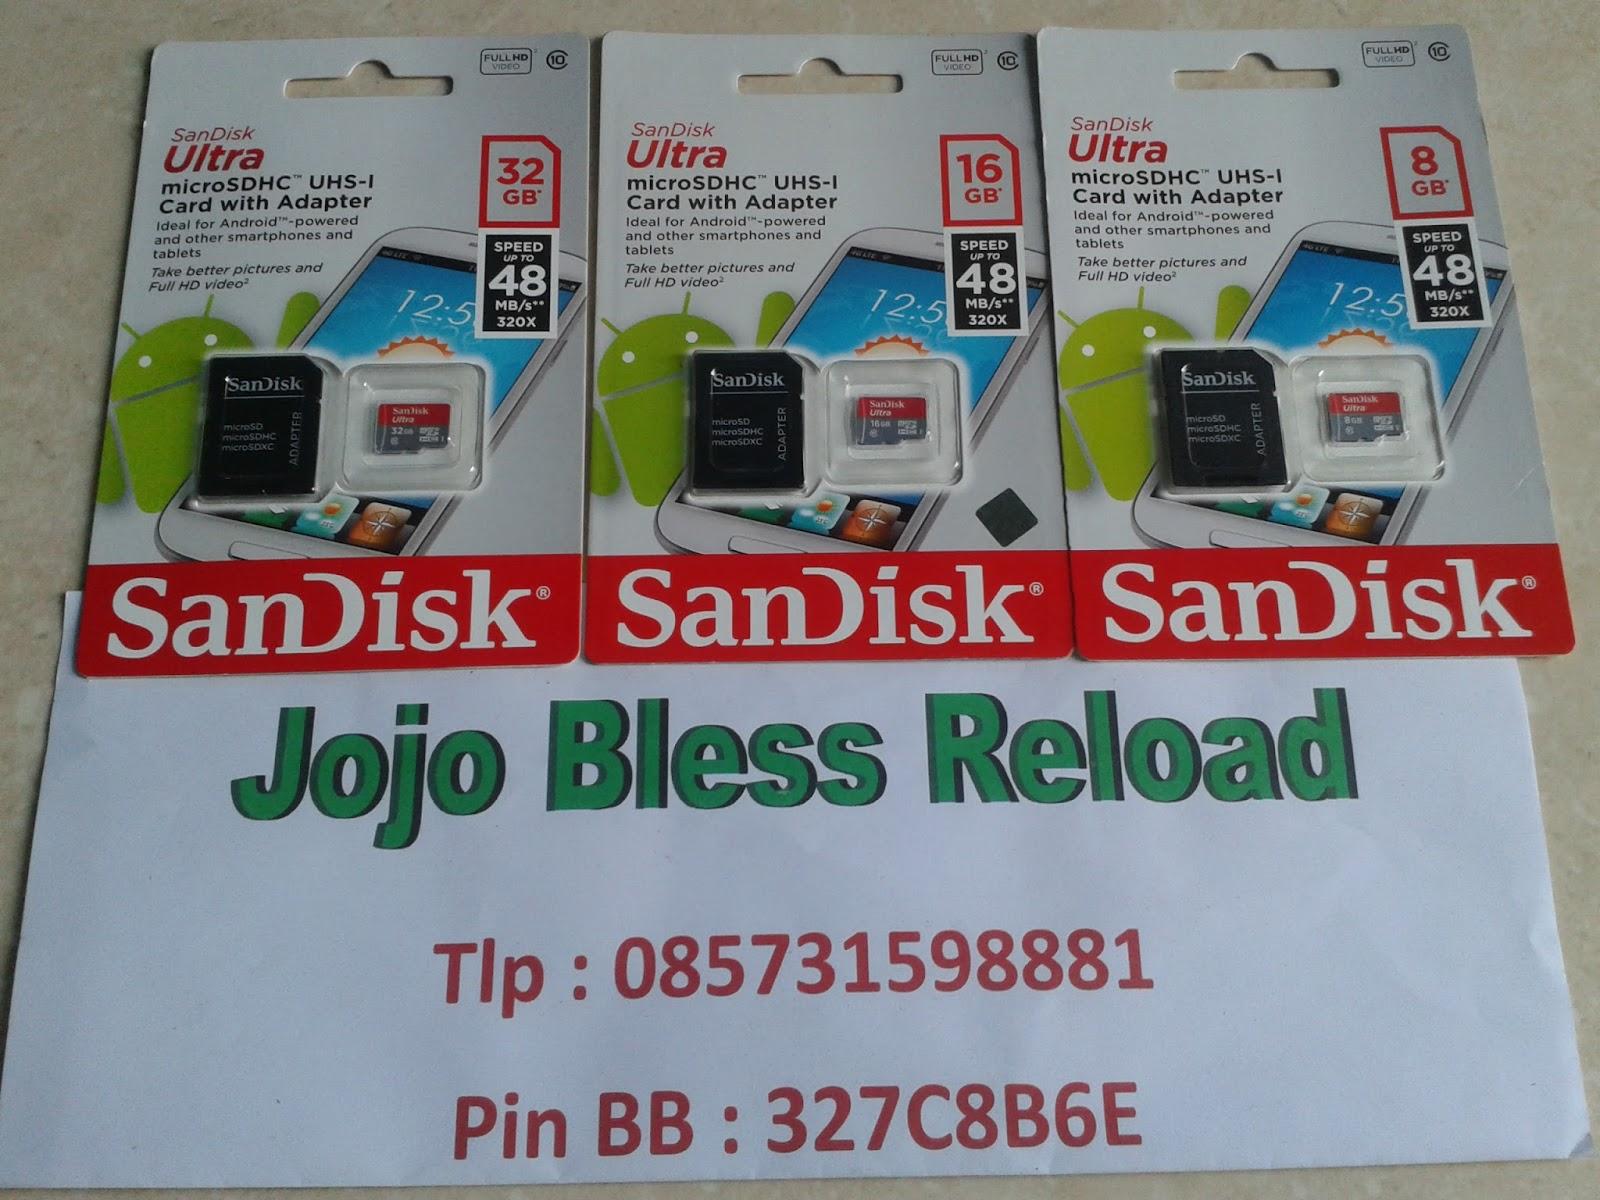 Aneka Memory Card Sandisk Ultra Microsd Class 10 48mb S Micro Sd 32gb No Adapter Garansi Resmi